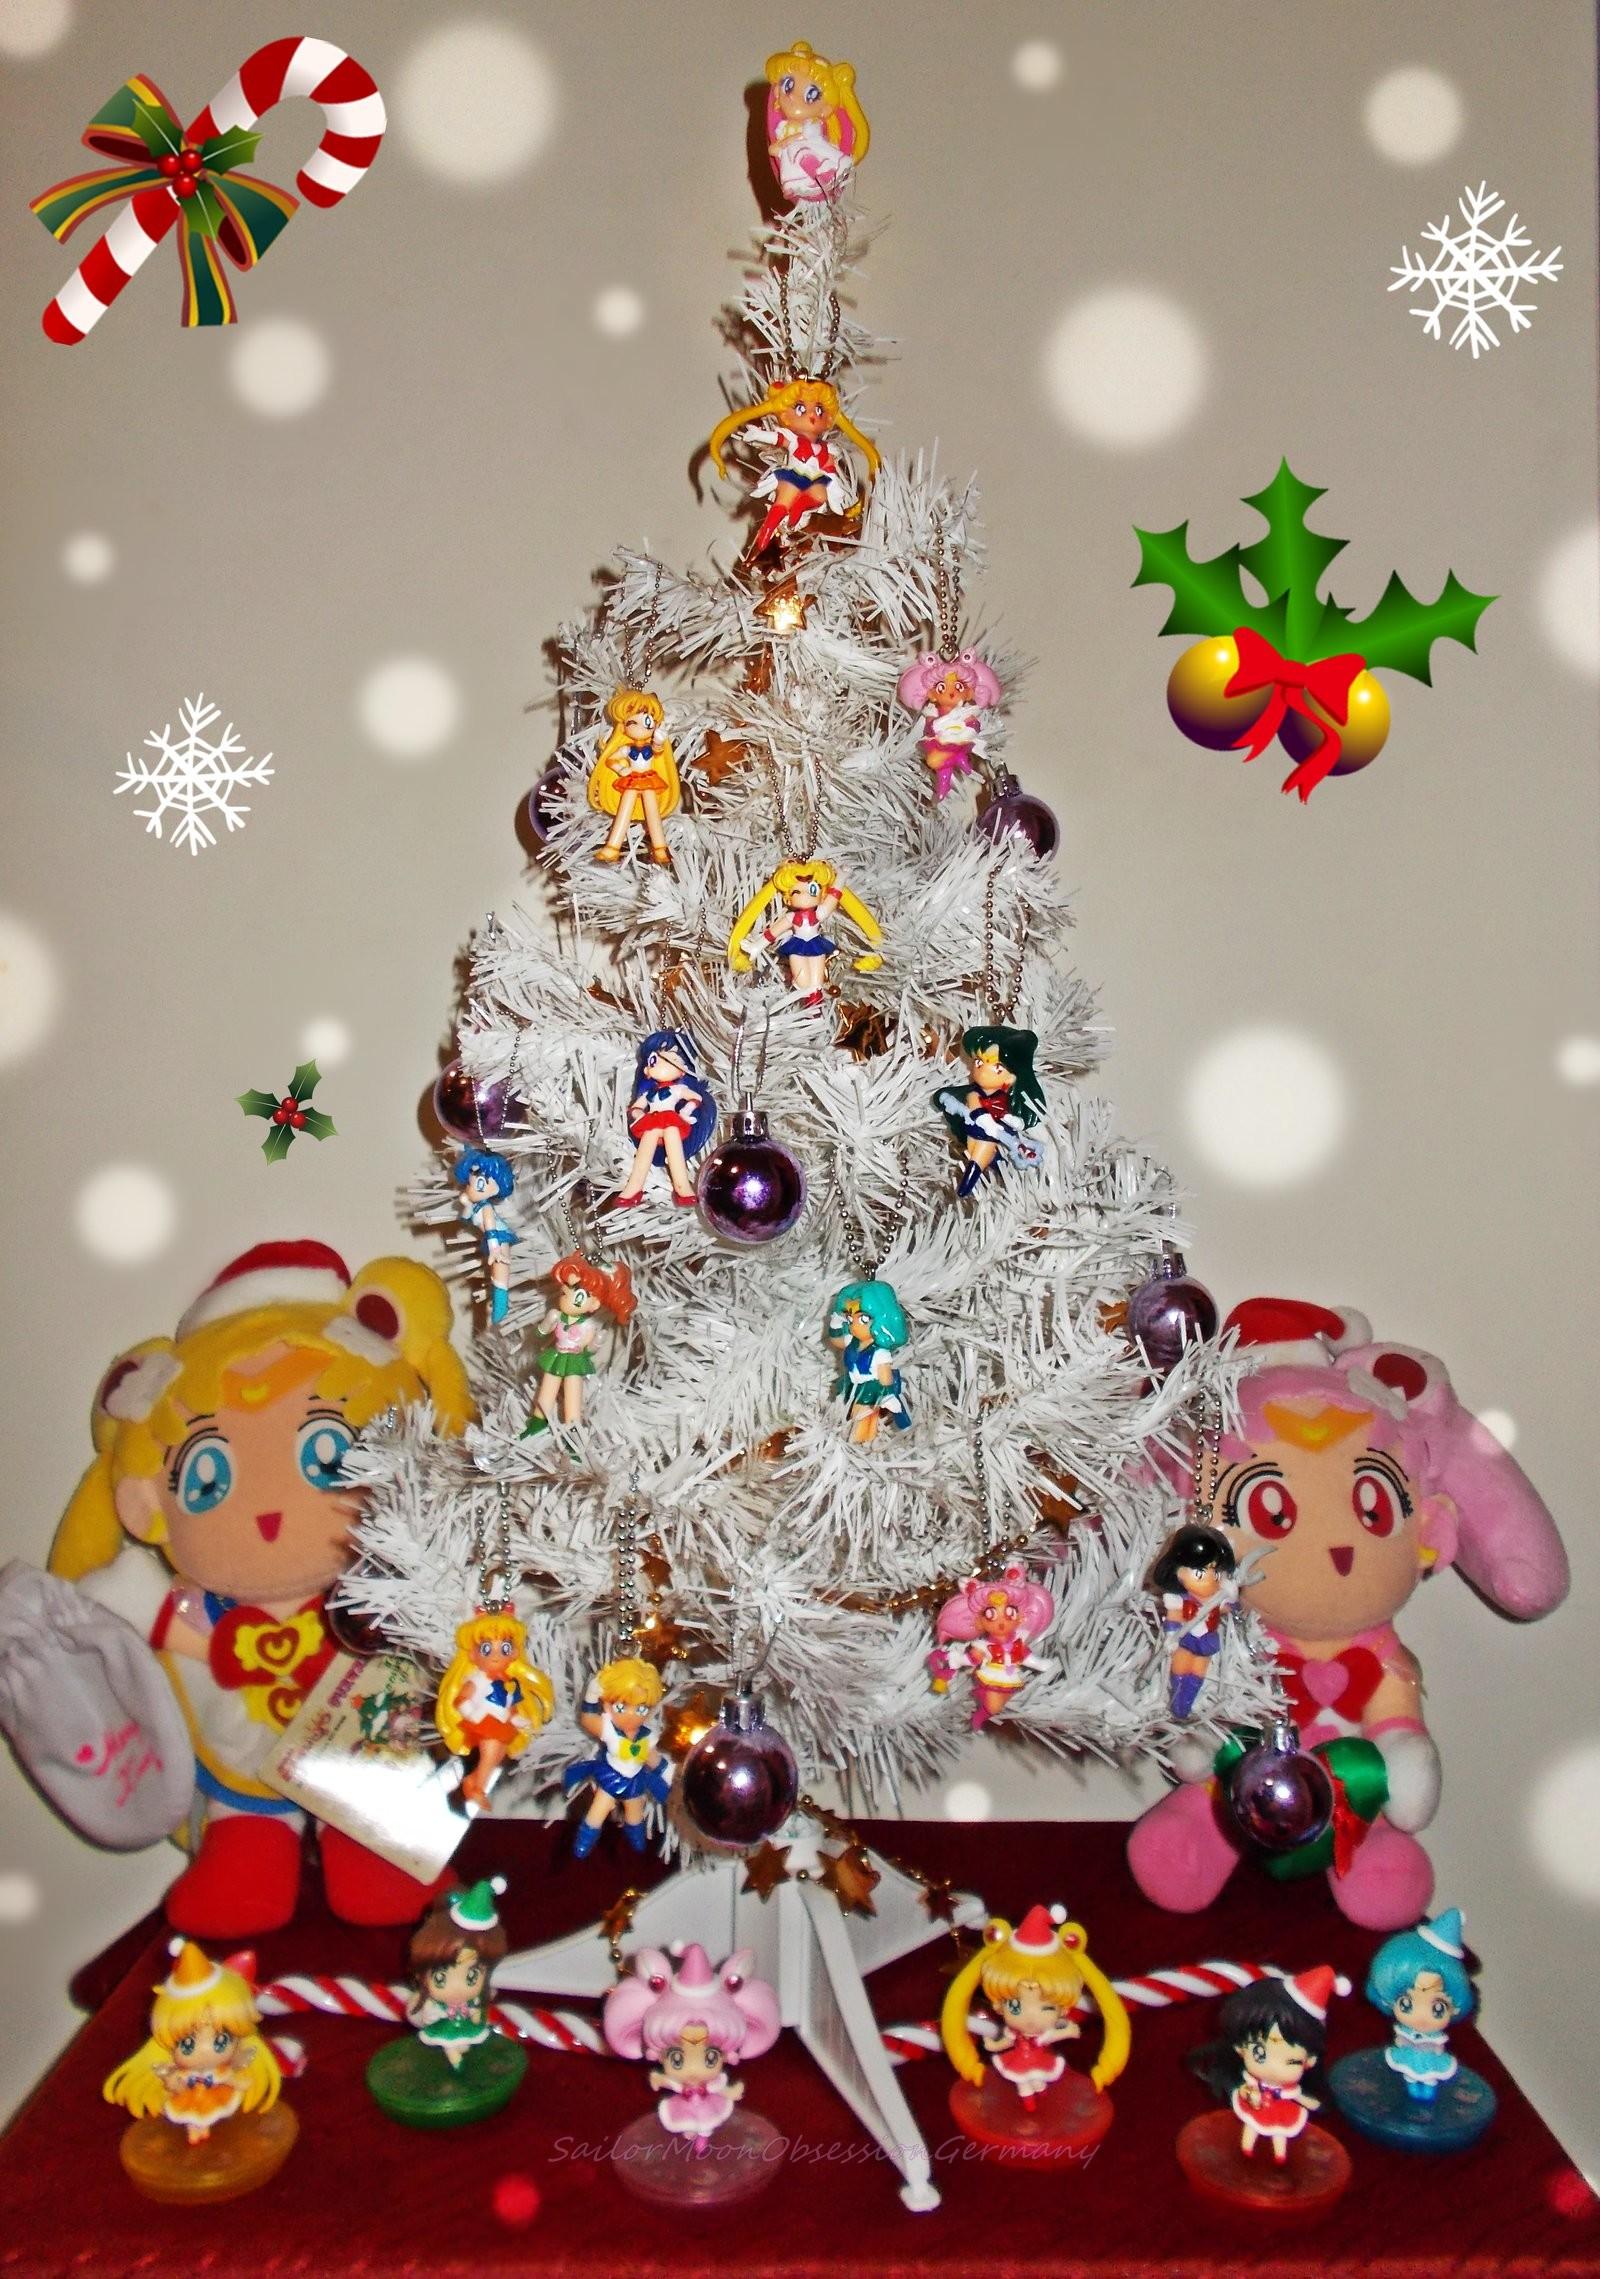 Sailor Moon Christmas Tree by SerenityofAsgard Sailor Moon Christmas Tree  by SerenityofAsgard